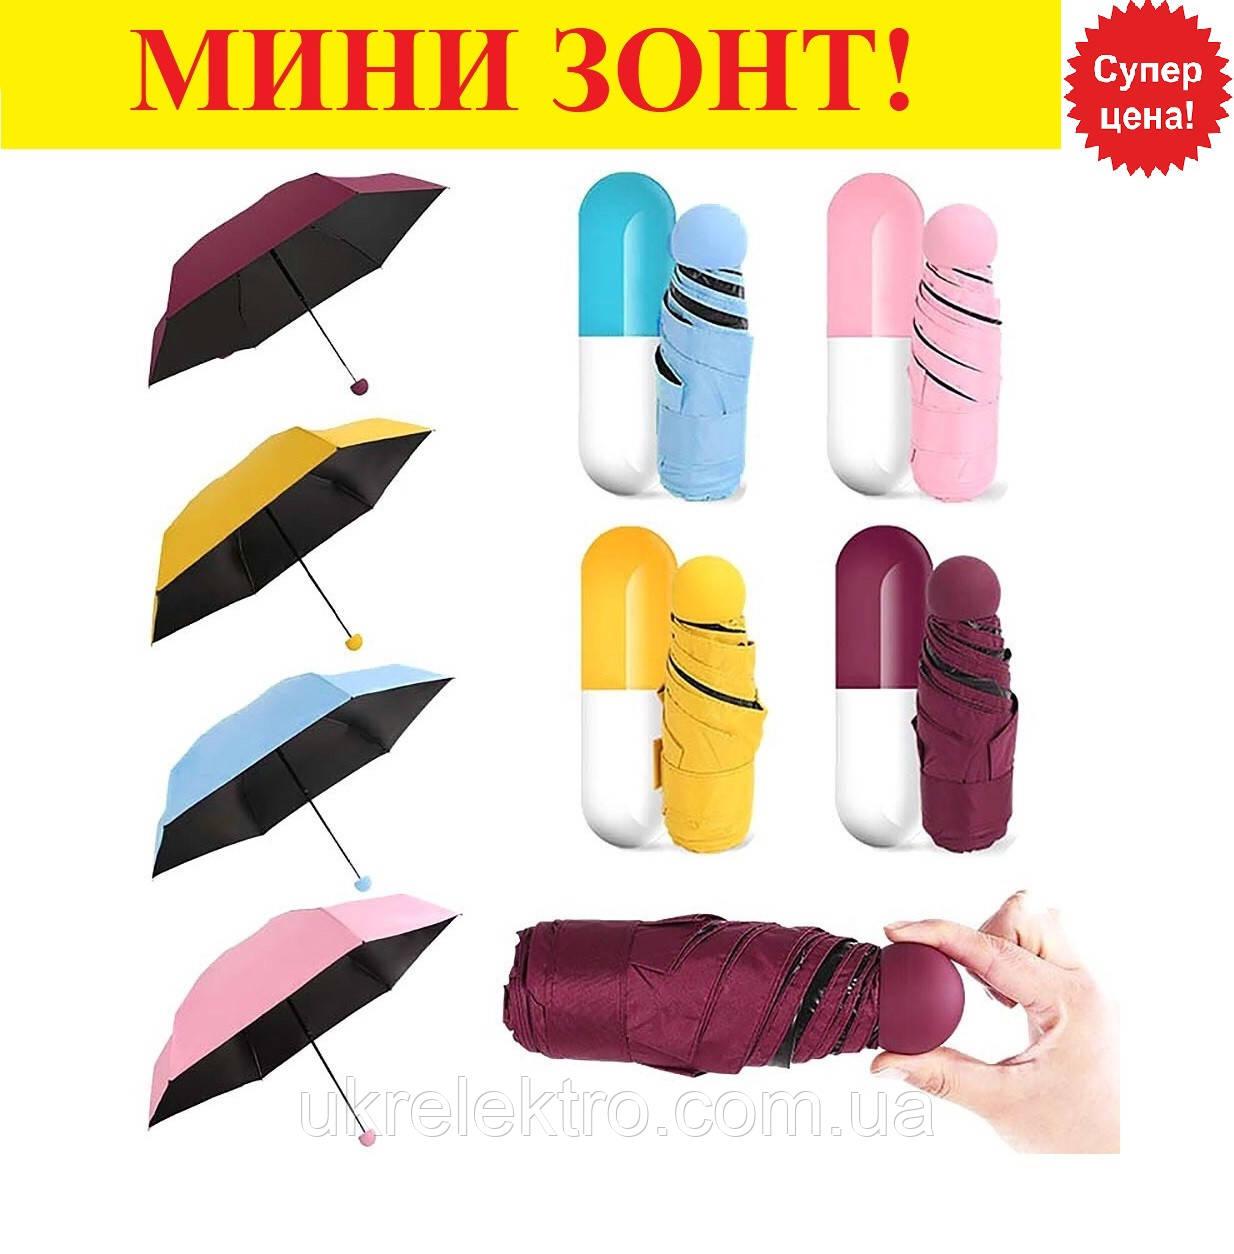 Зонт-капсула, компактный зонт / Capsule Umbrella / Мини-зонт